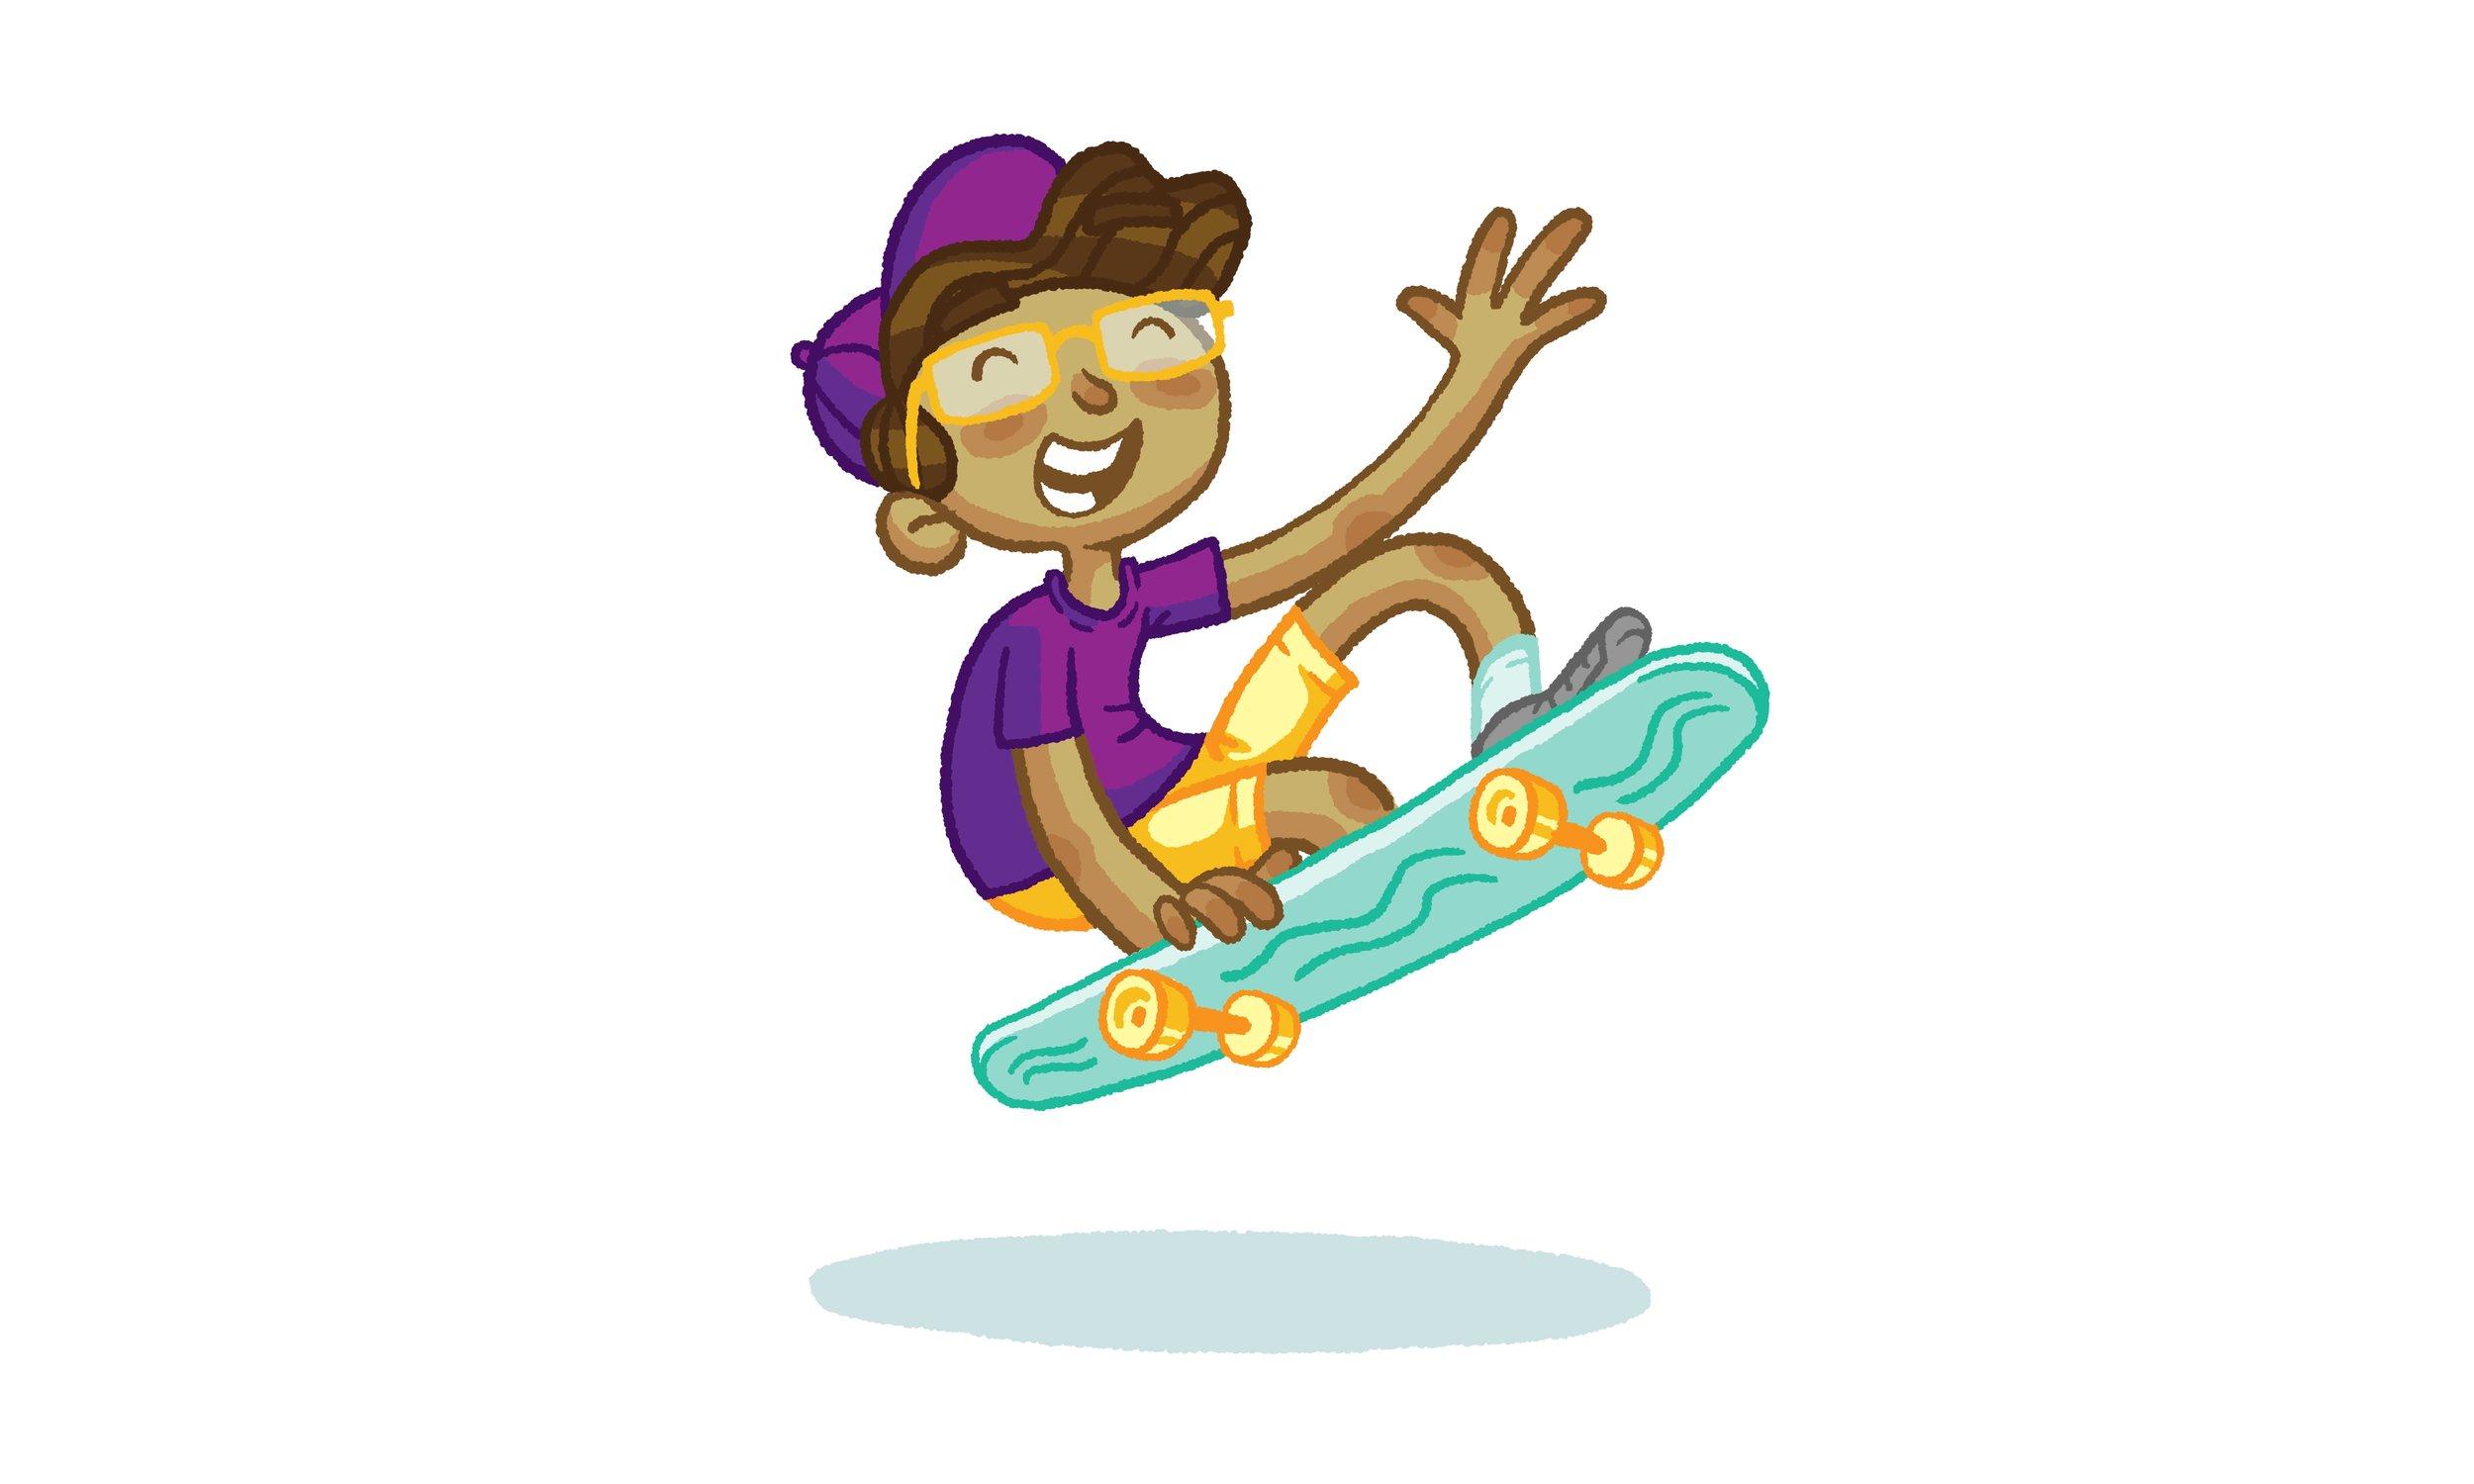 descon_skateboarding.jpg